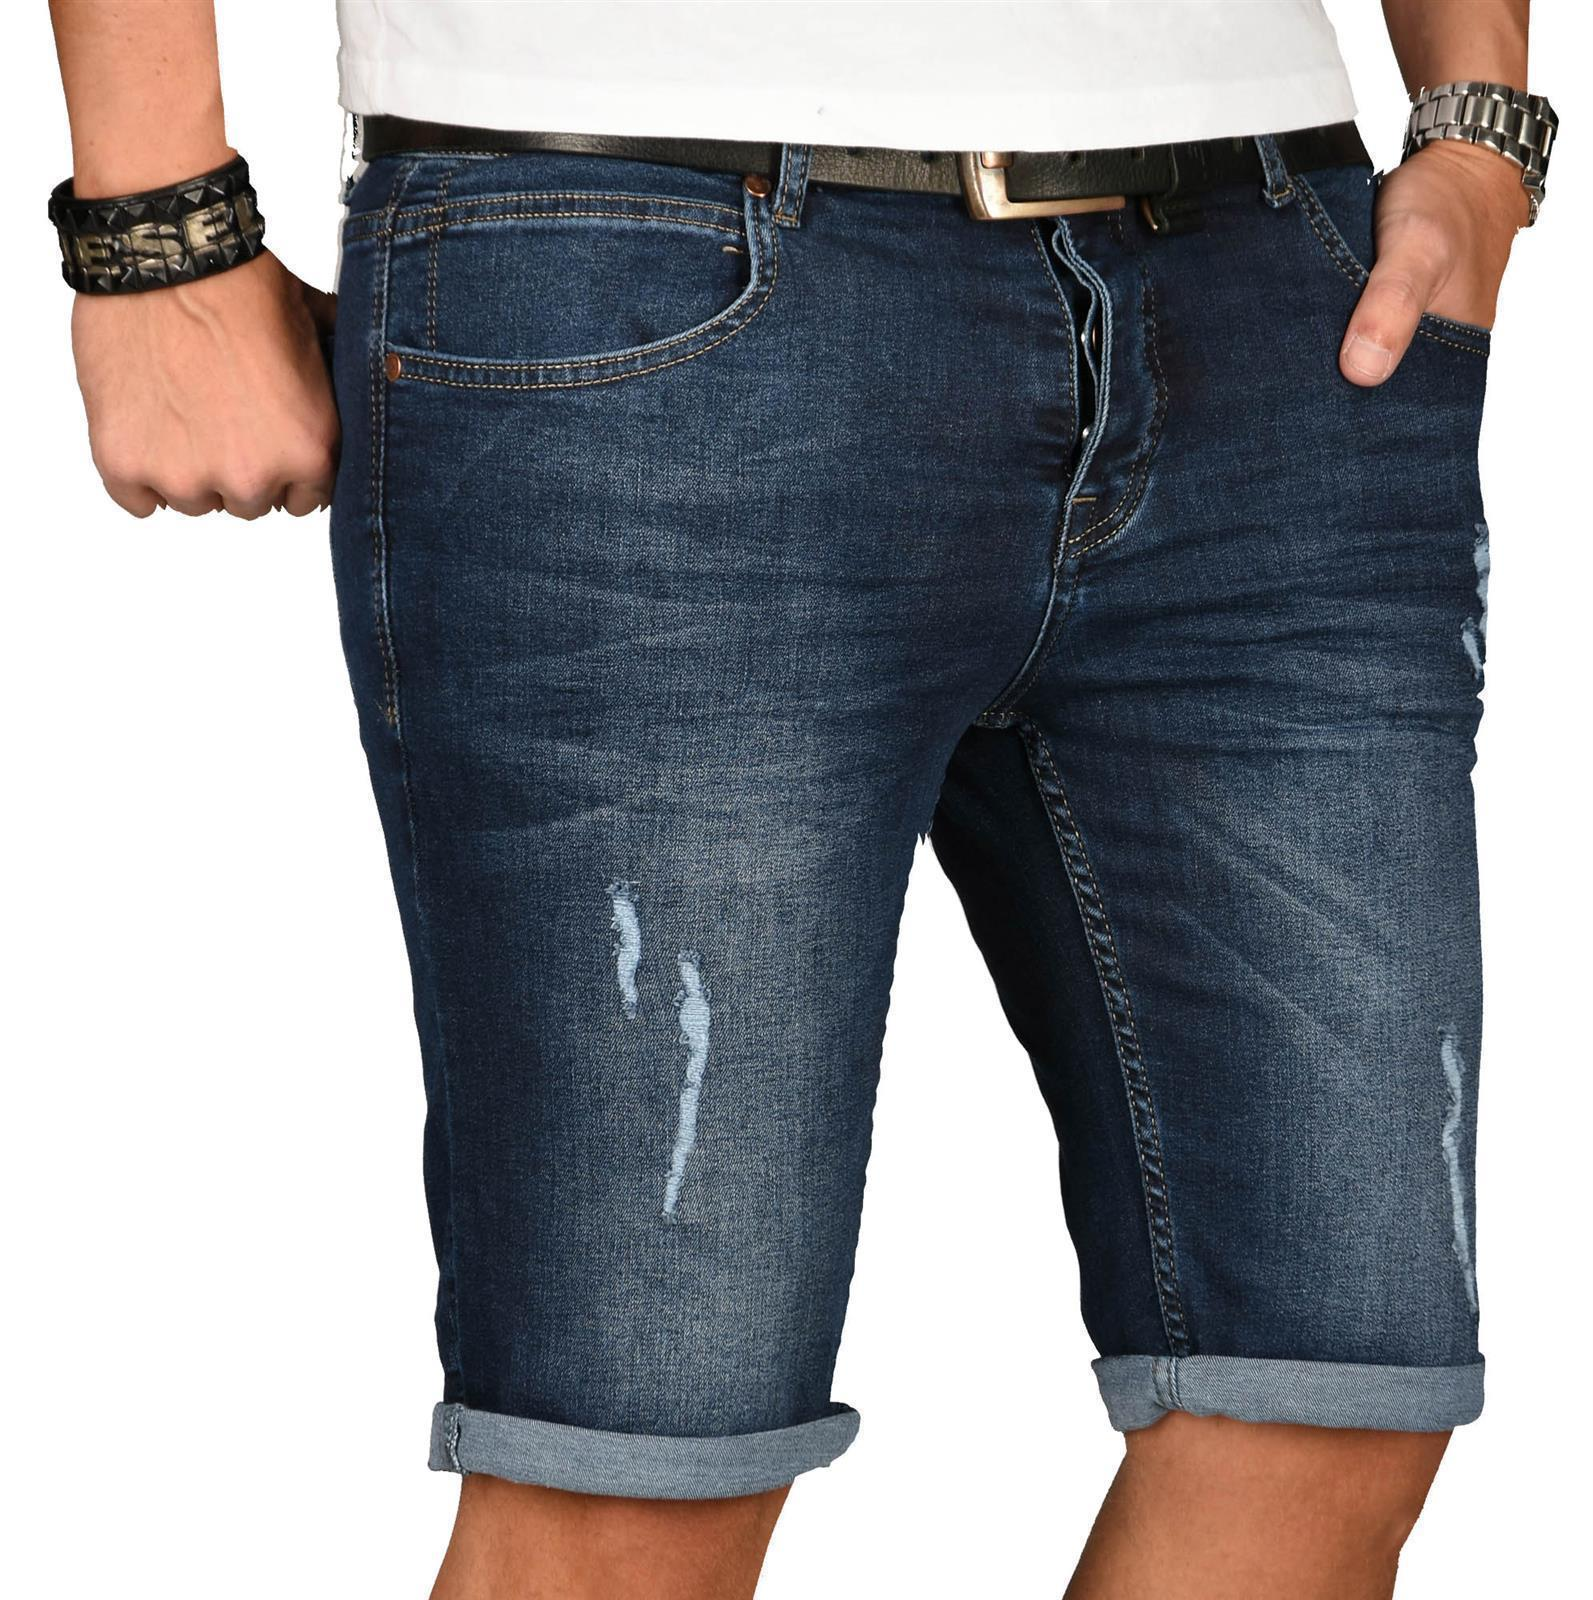 A-Salvarini-Herren-Designer-Jeans-Short-kurze-Hose-Slim-Sommer-Shorts-Washed Indexbild 35